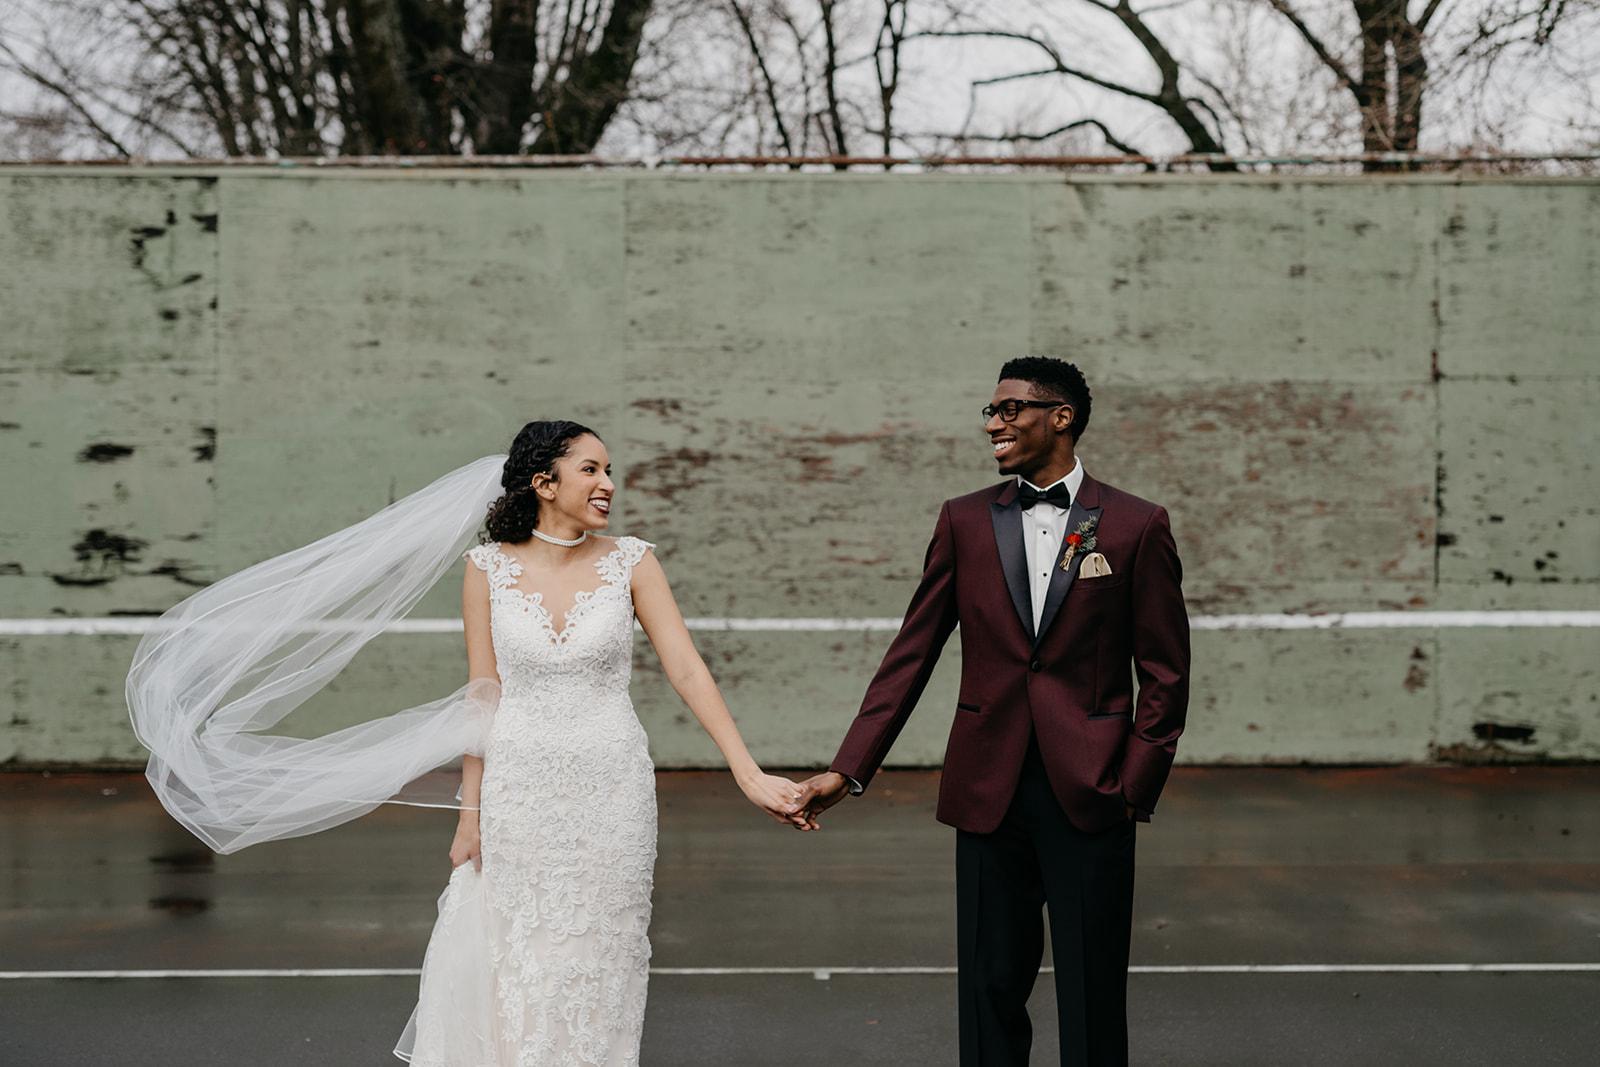 portland - wedding - photographer - doorofhopechurch146.jpg